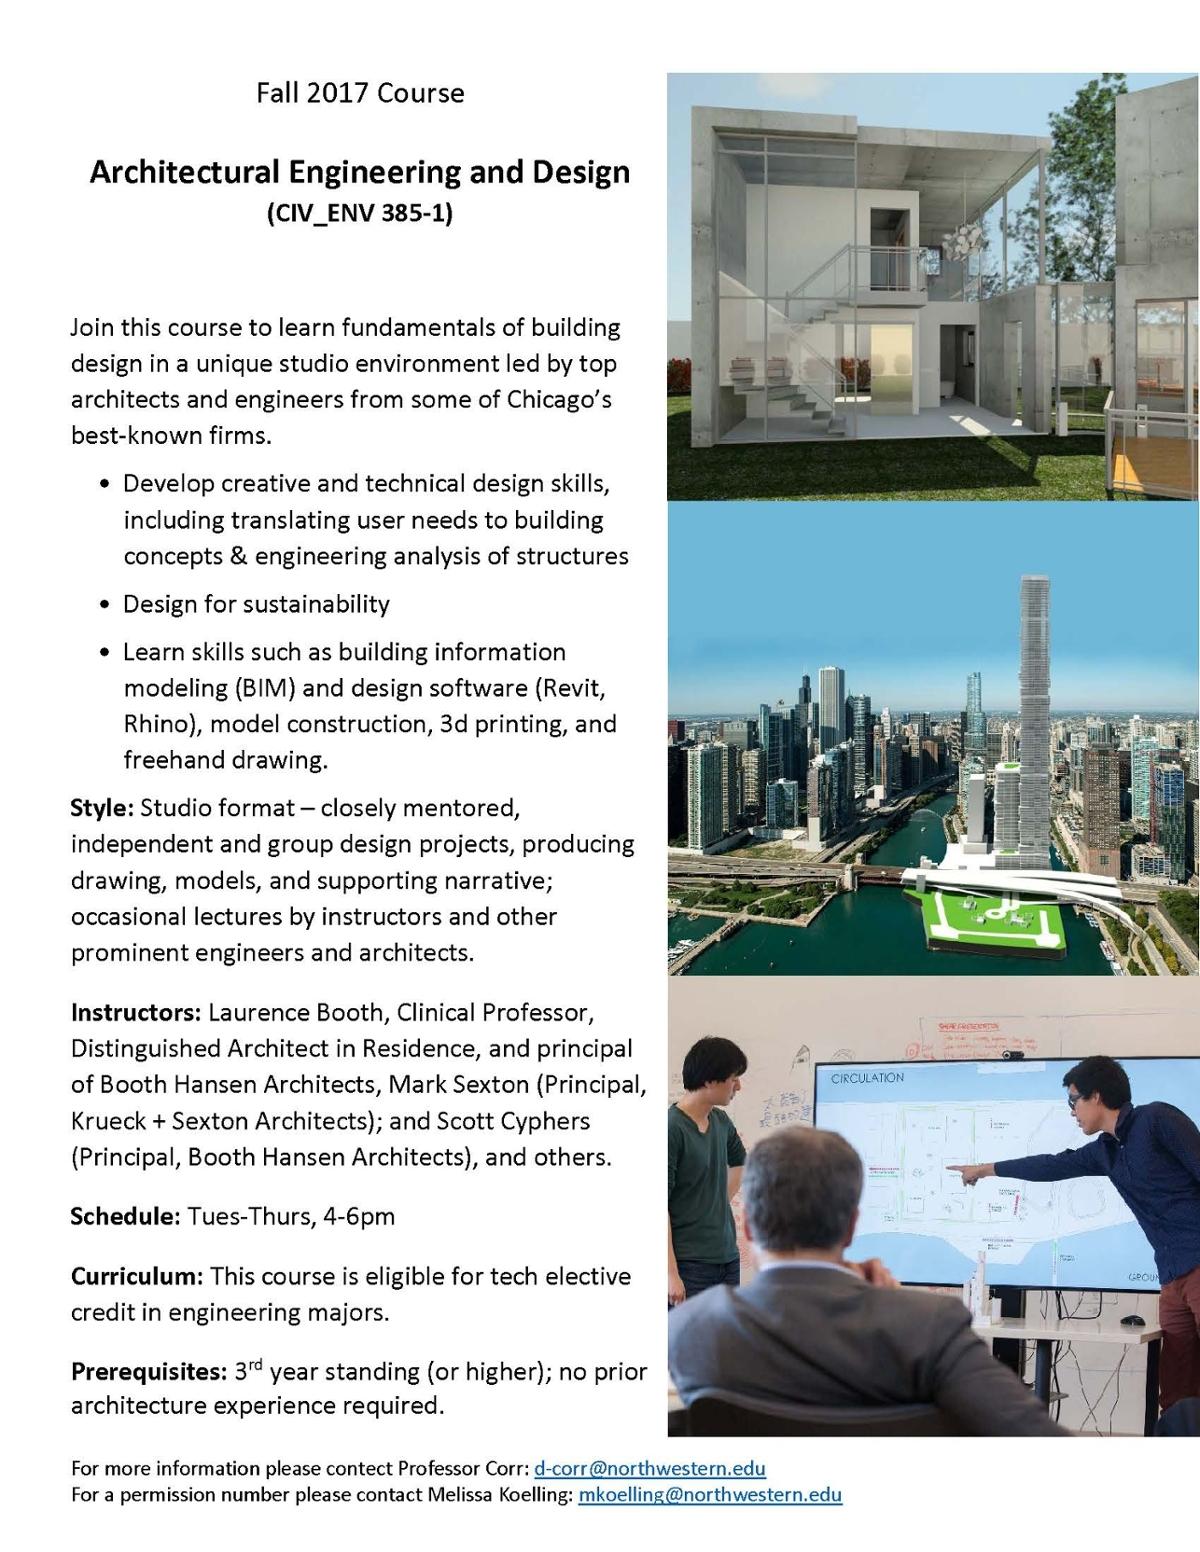 Fall Architecture And Design Courses Courses Civil